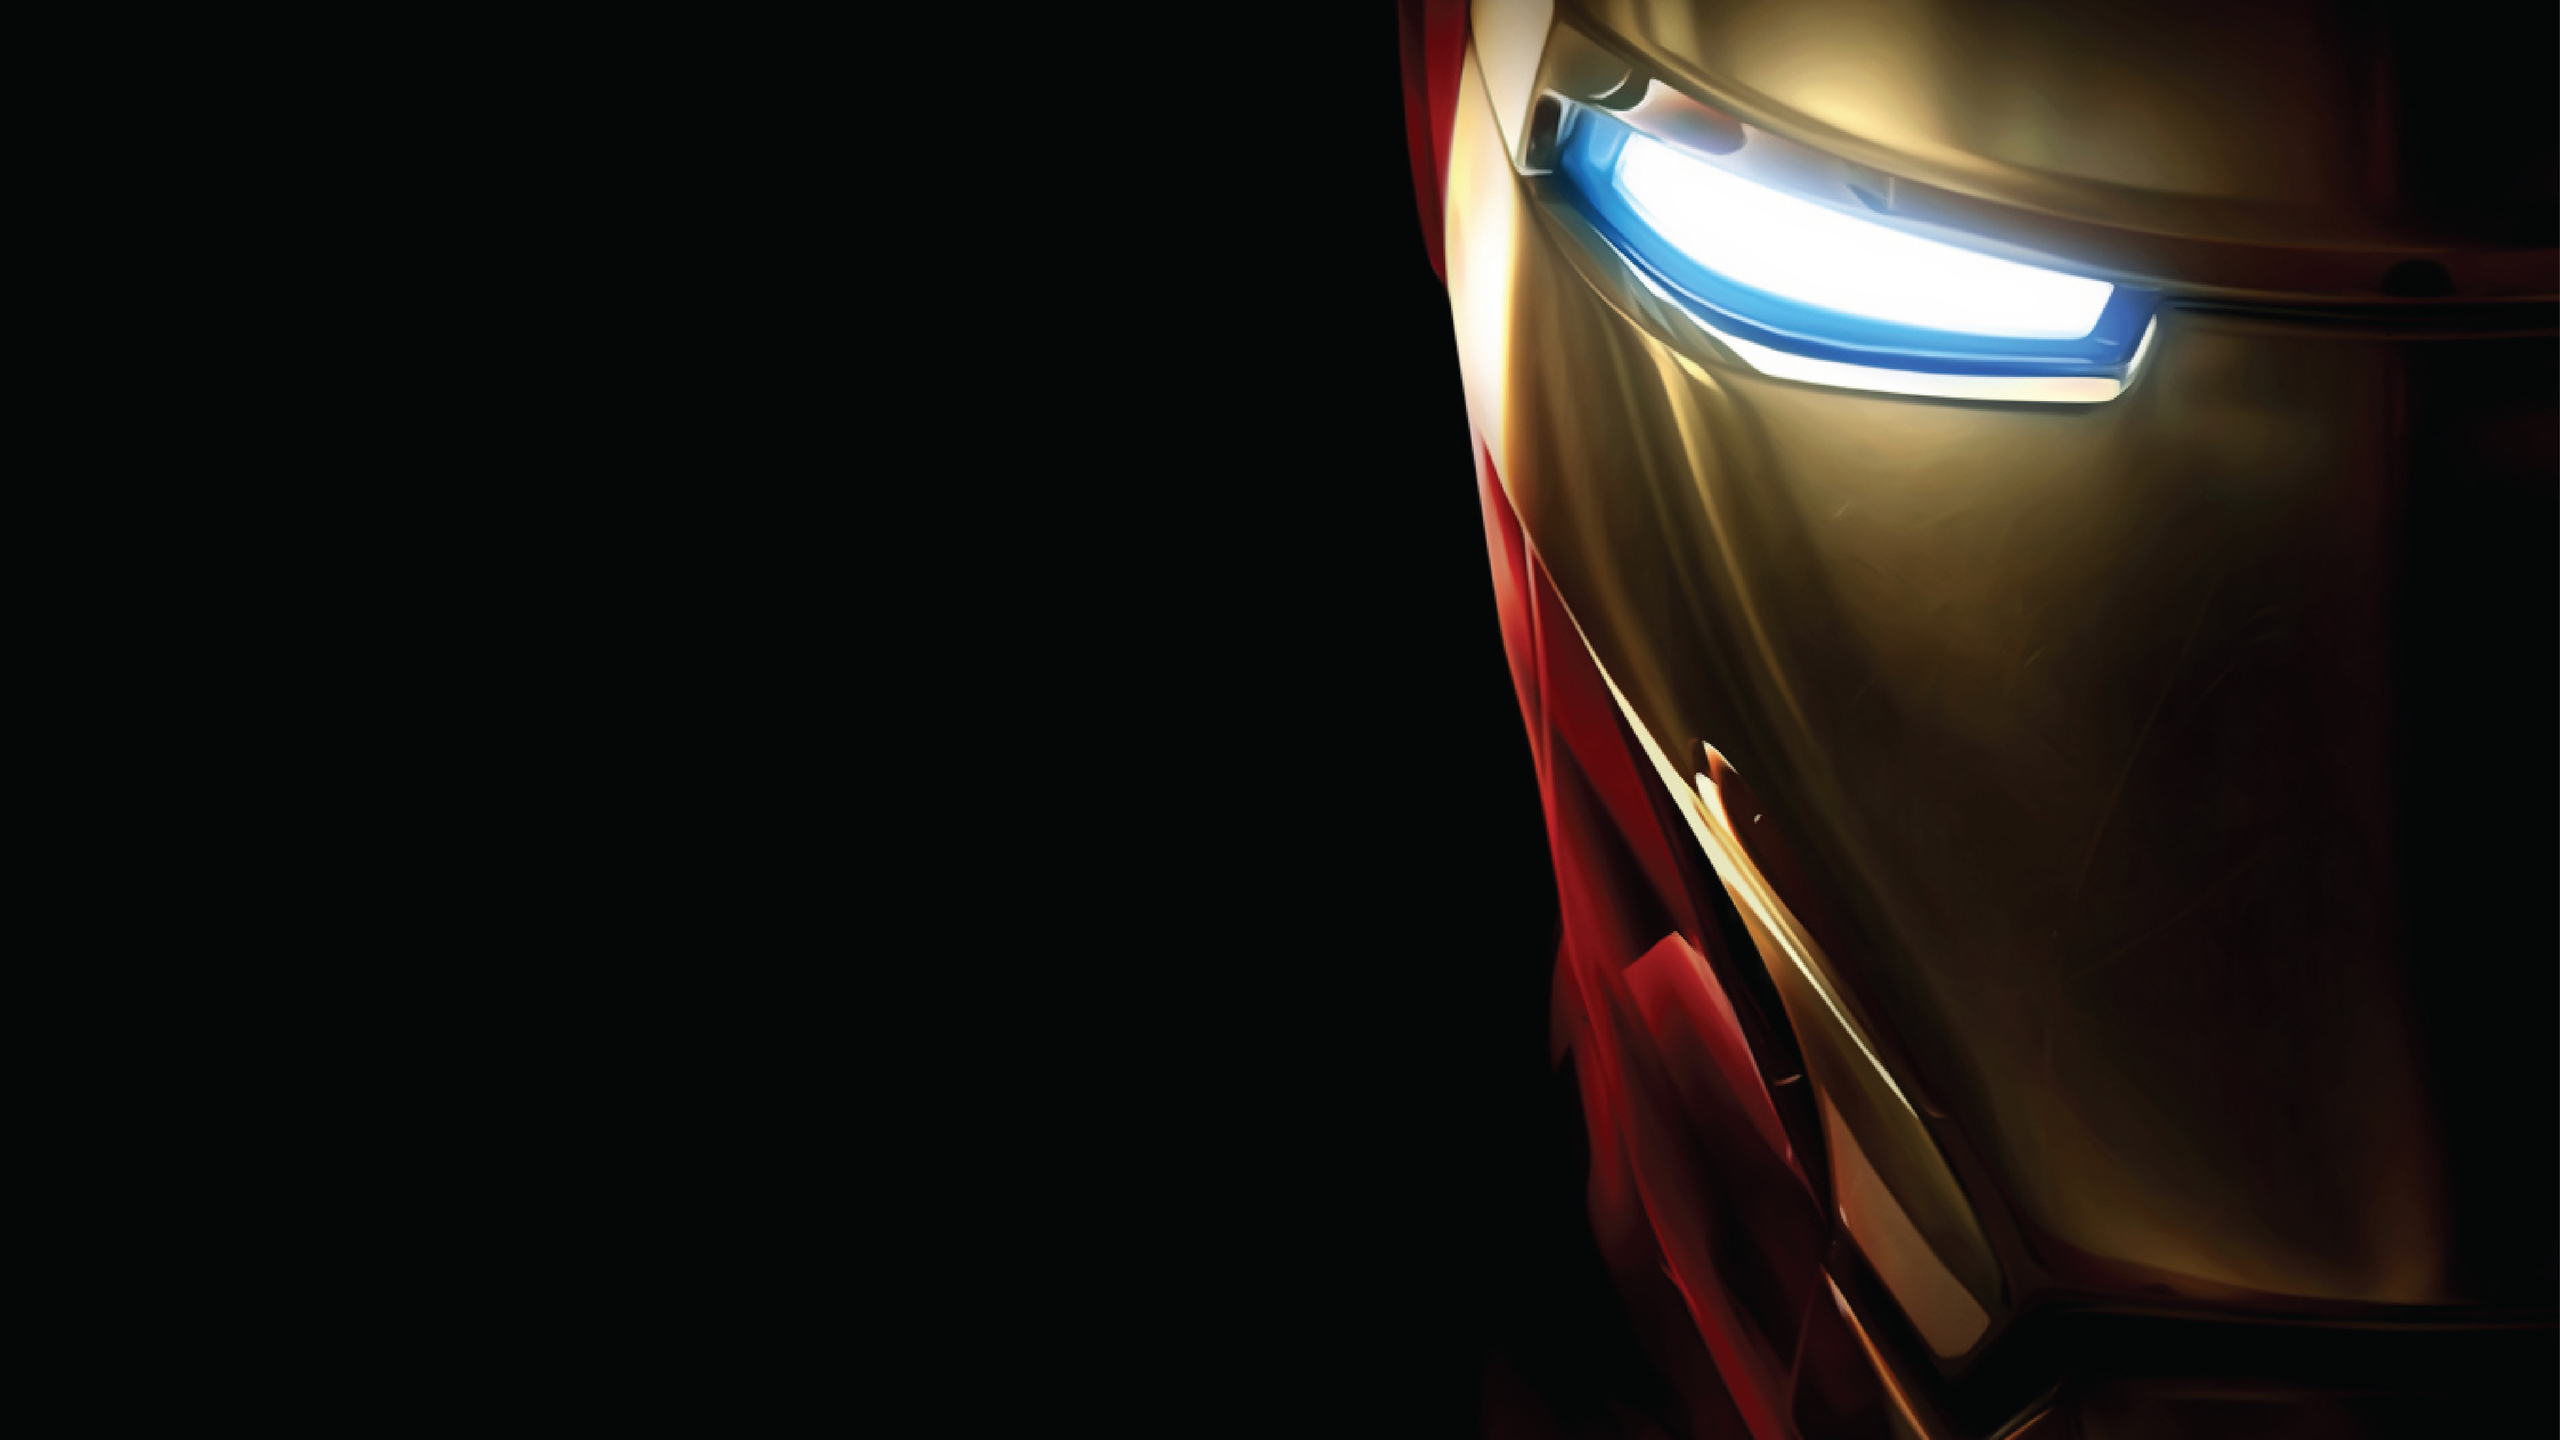 2560x1440 Iron Man Low Poly 4k Art 1440P Resolution HD 4k ...